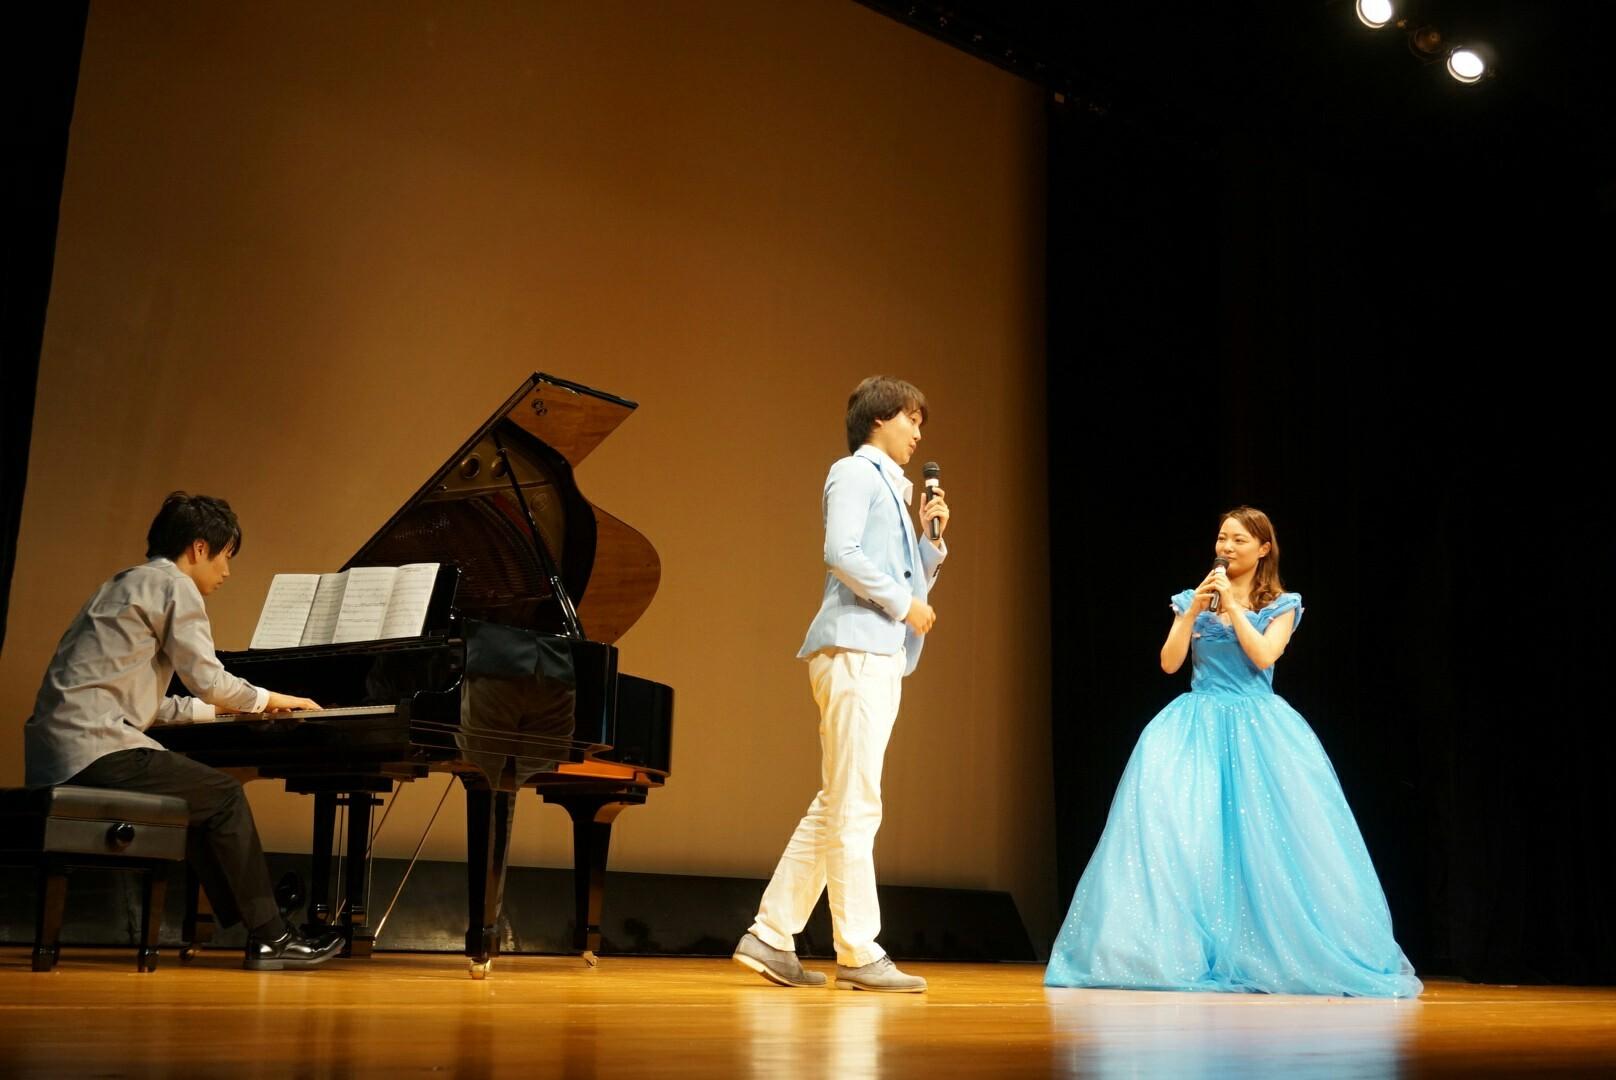 Baby&Mama ART presents 東京藝術大学生による「0歳からのコンサート~ミュージカルハイライト」